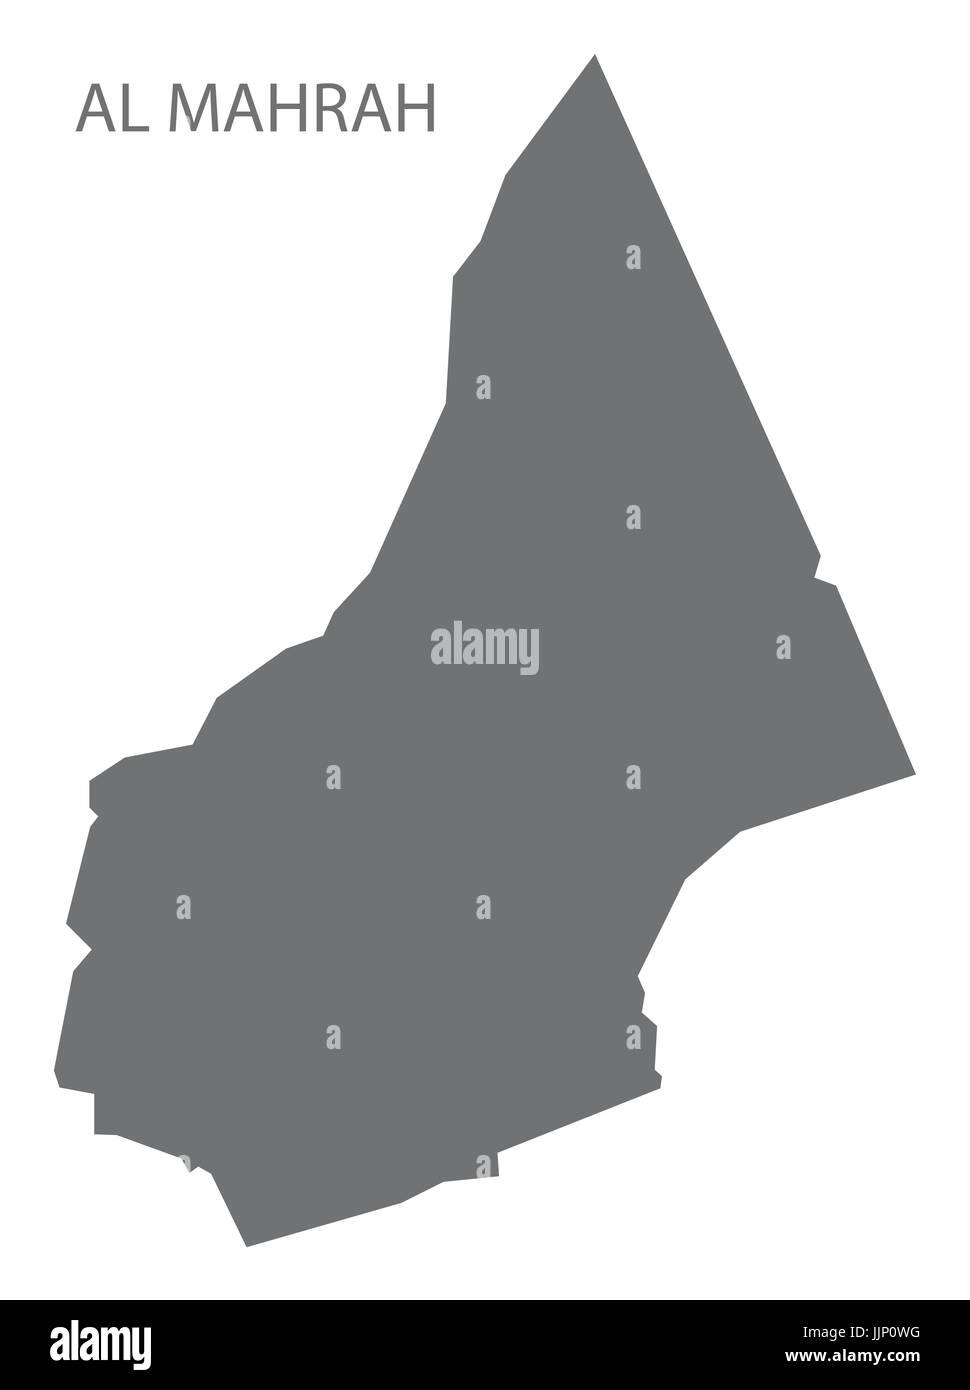 Al Mahrah Yemen governorate map grey illustration silhouette shape - Stock Image